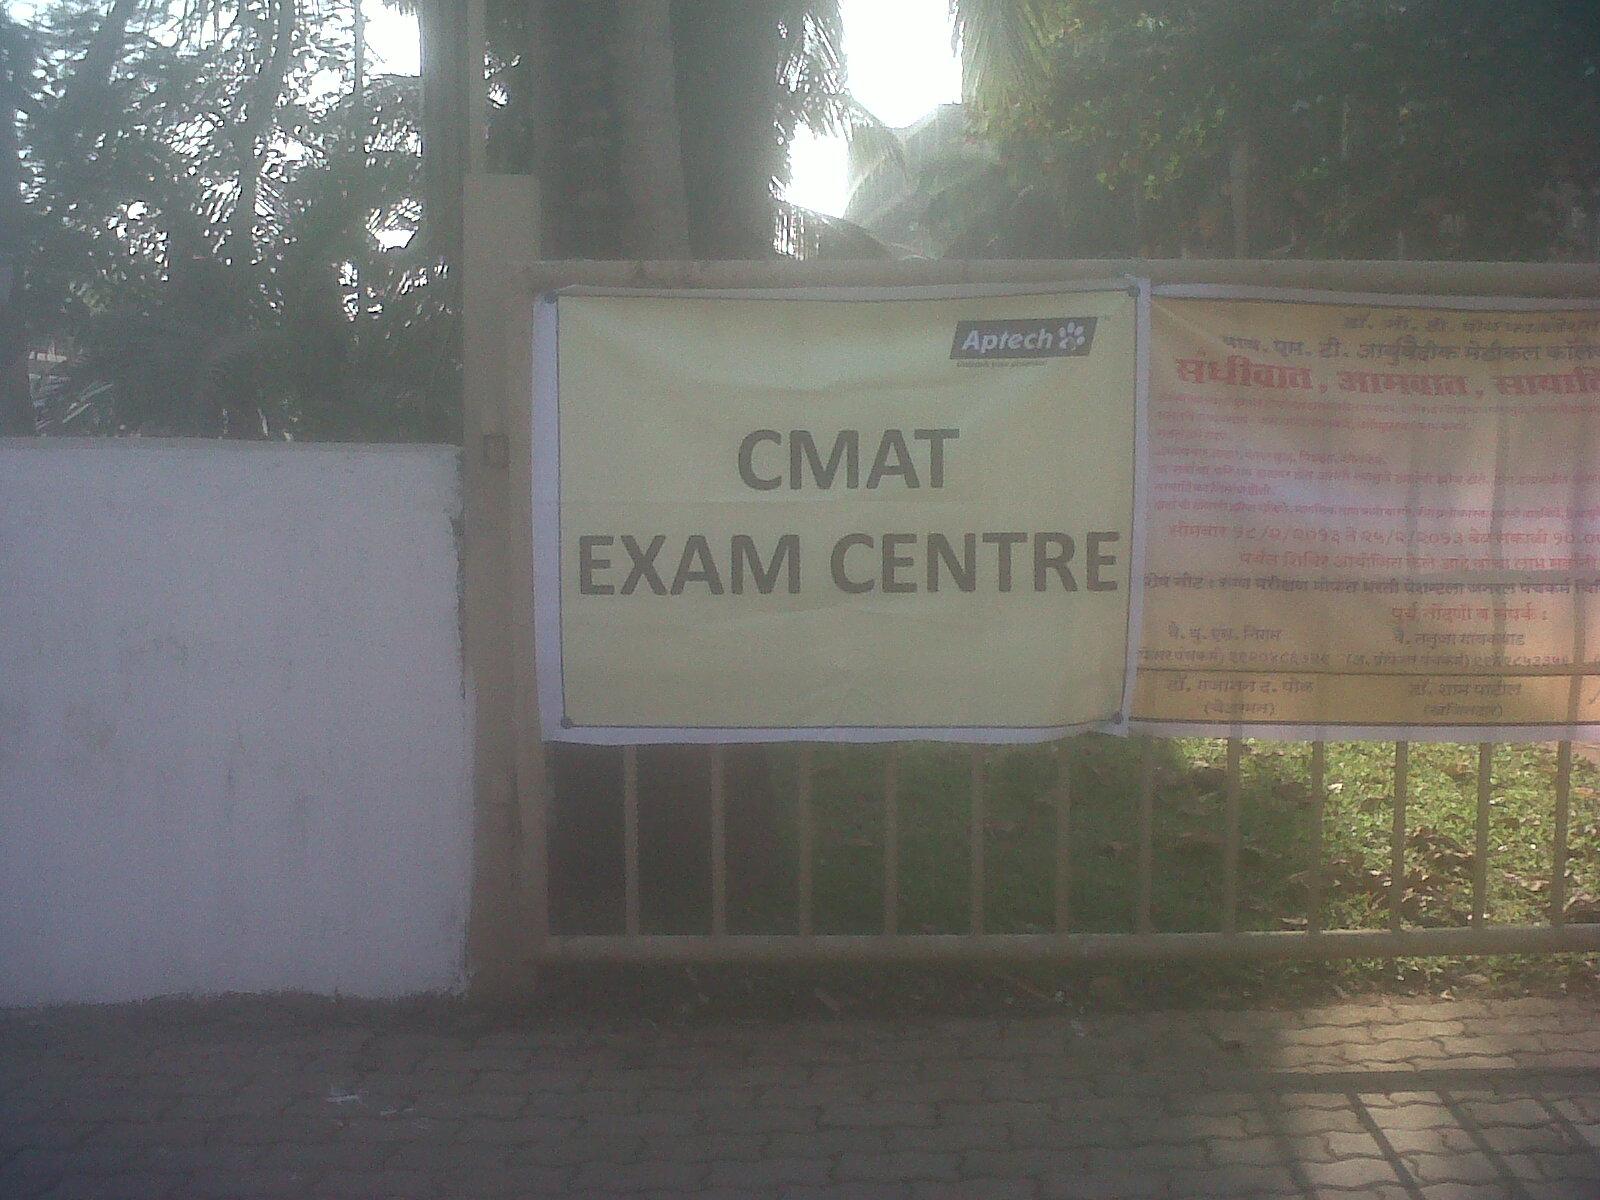 CMAT Centre